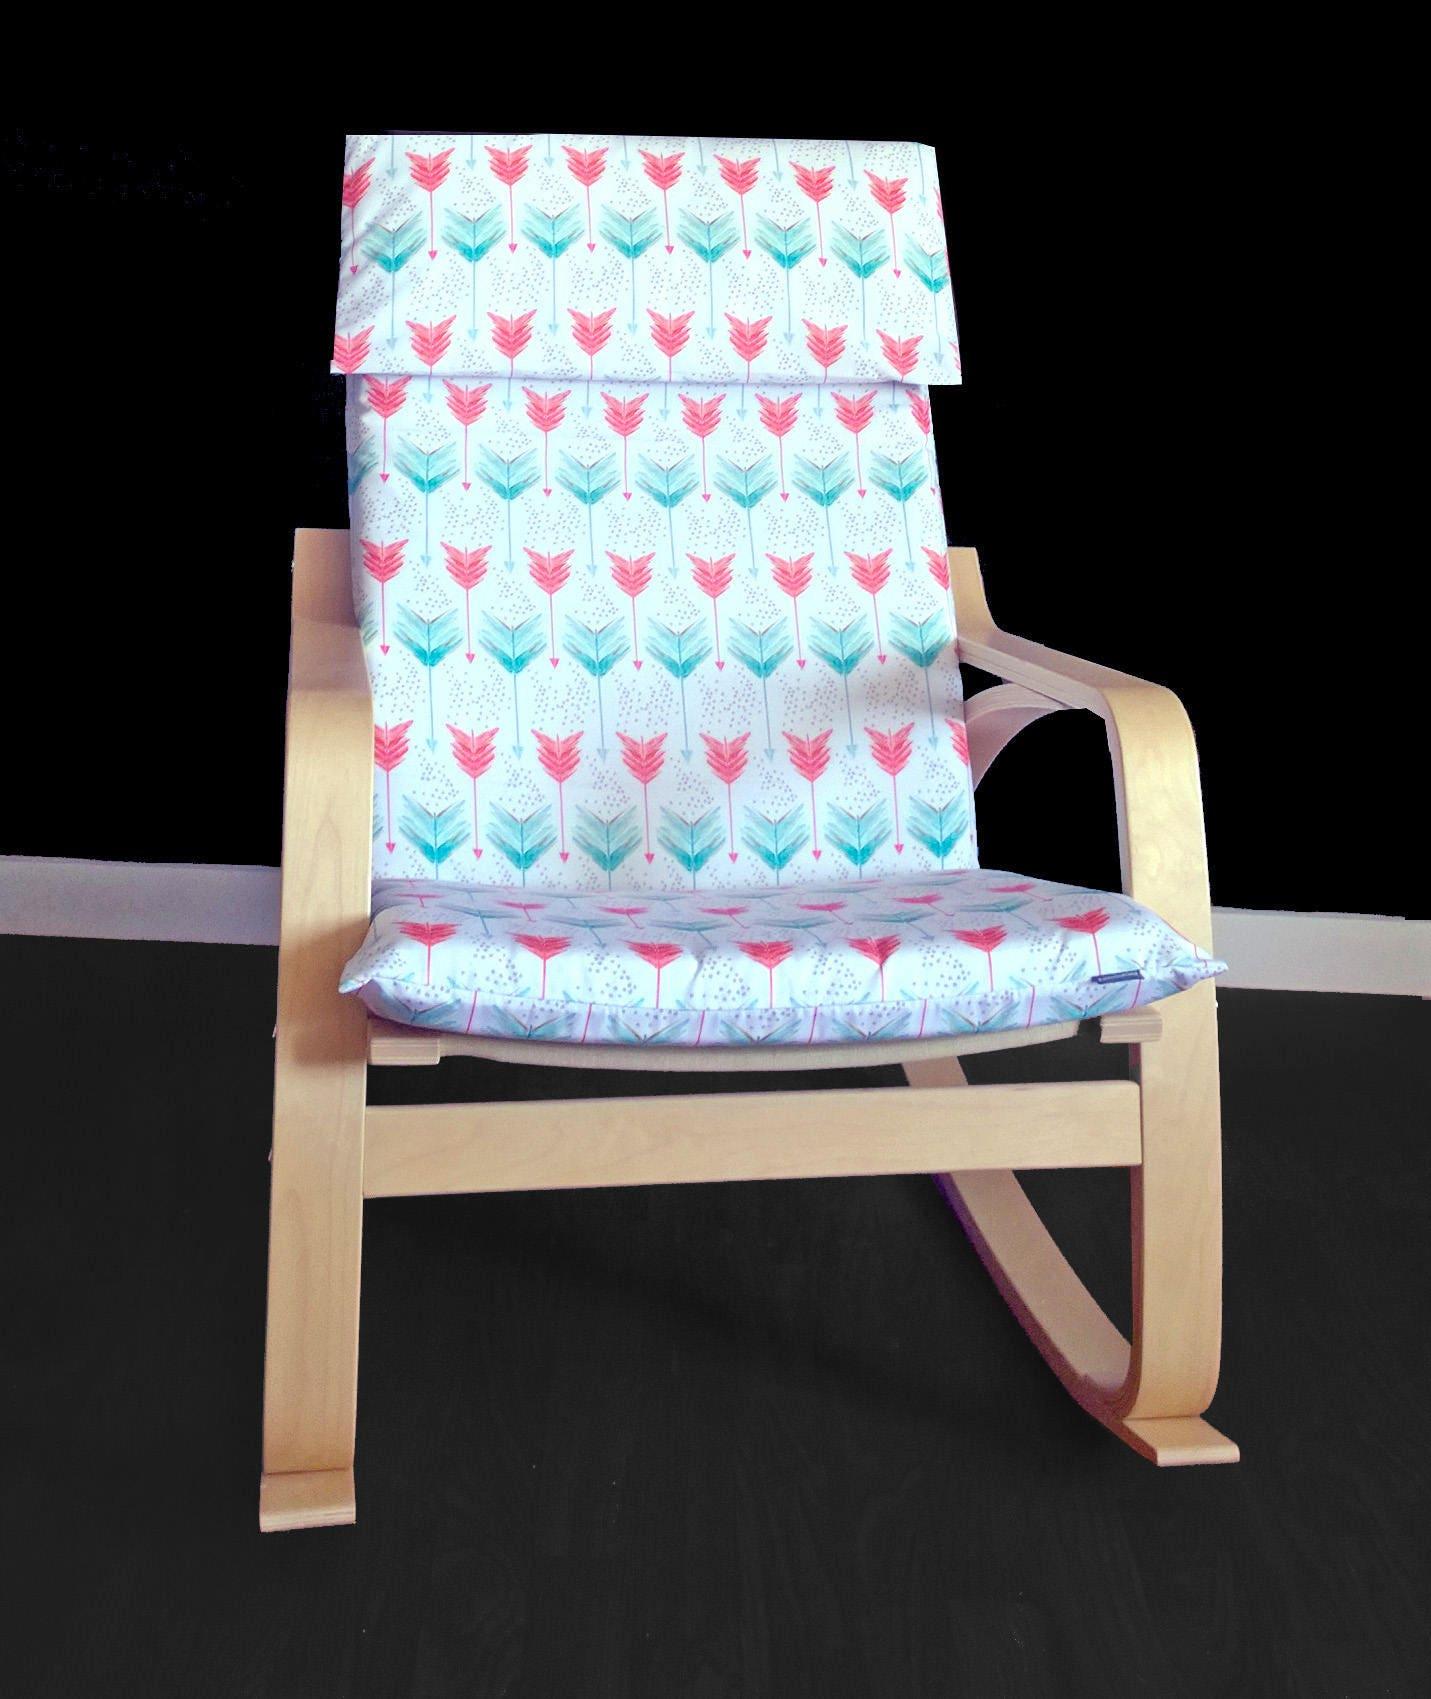 ikea po ng custom cushion slipcover unique ikea decor etsy. Black Bedroom Furniture Sets. Home Design Ideas